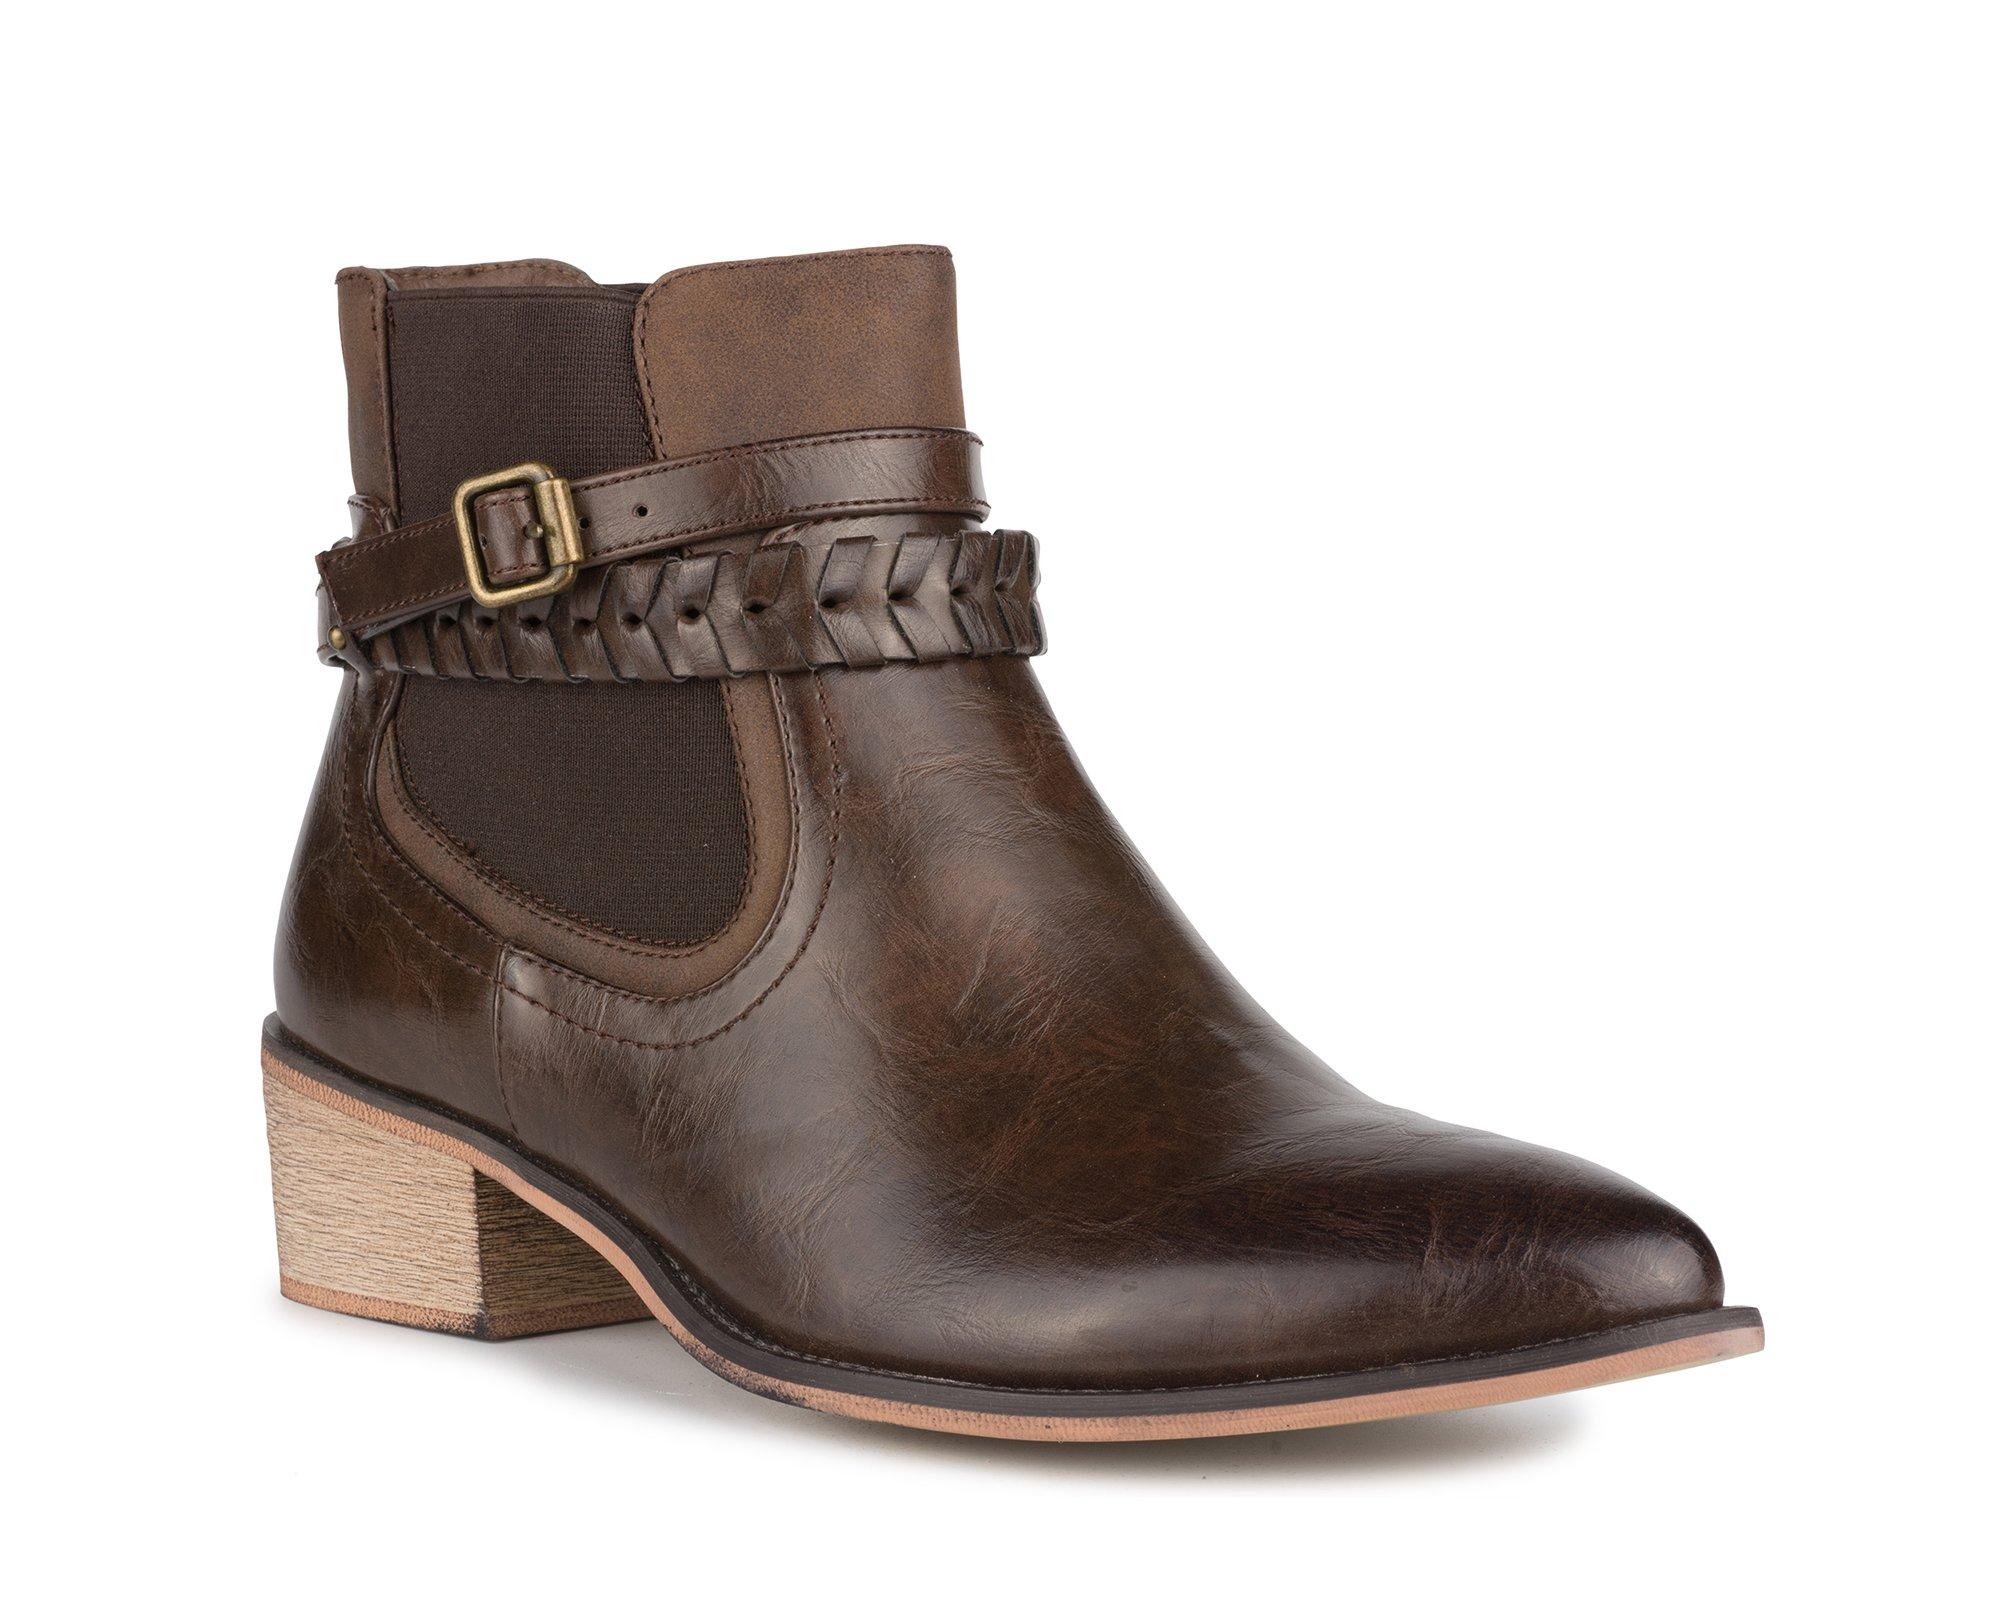 Twisted Women's Harper Western Chelsea Ankle Boot- HARPER01 Dark Brown, Size 8